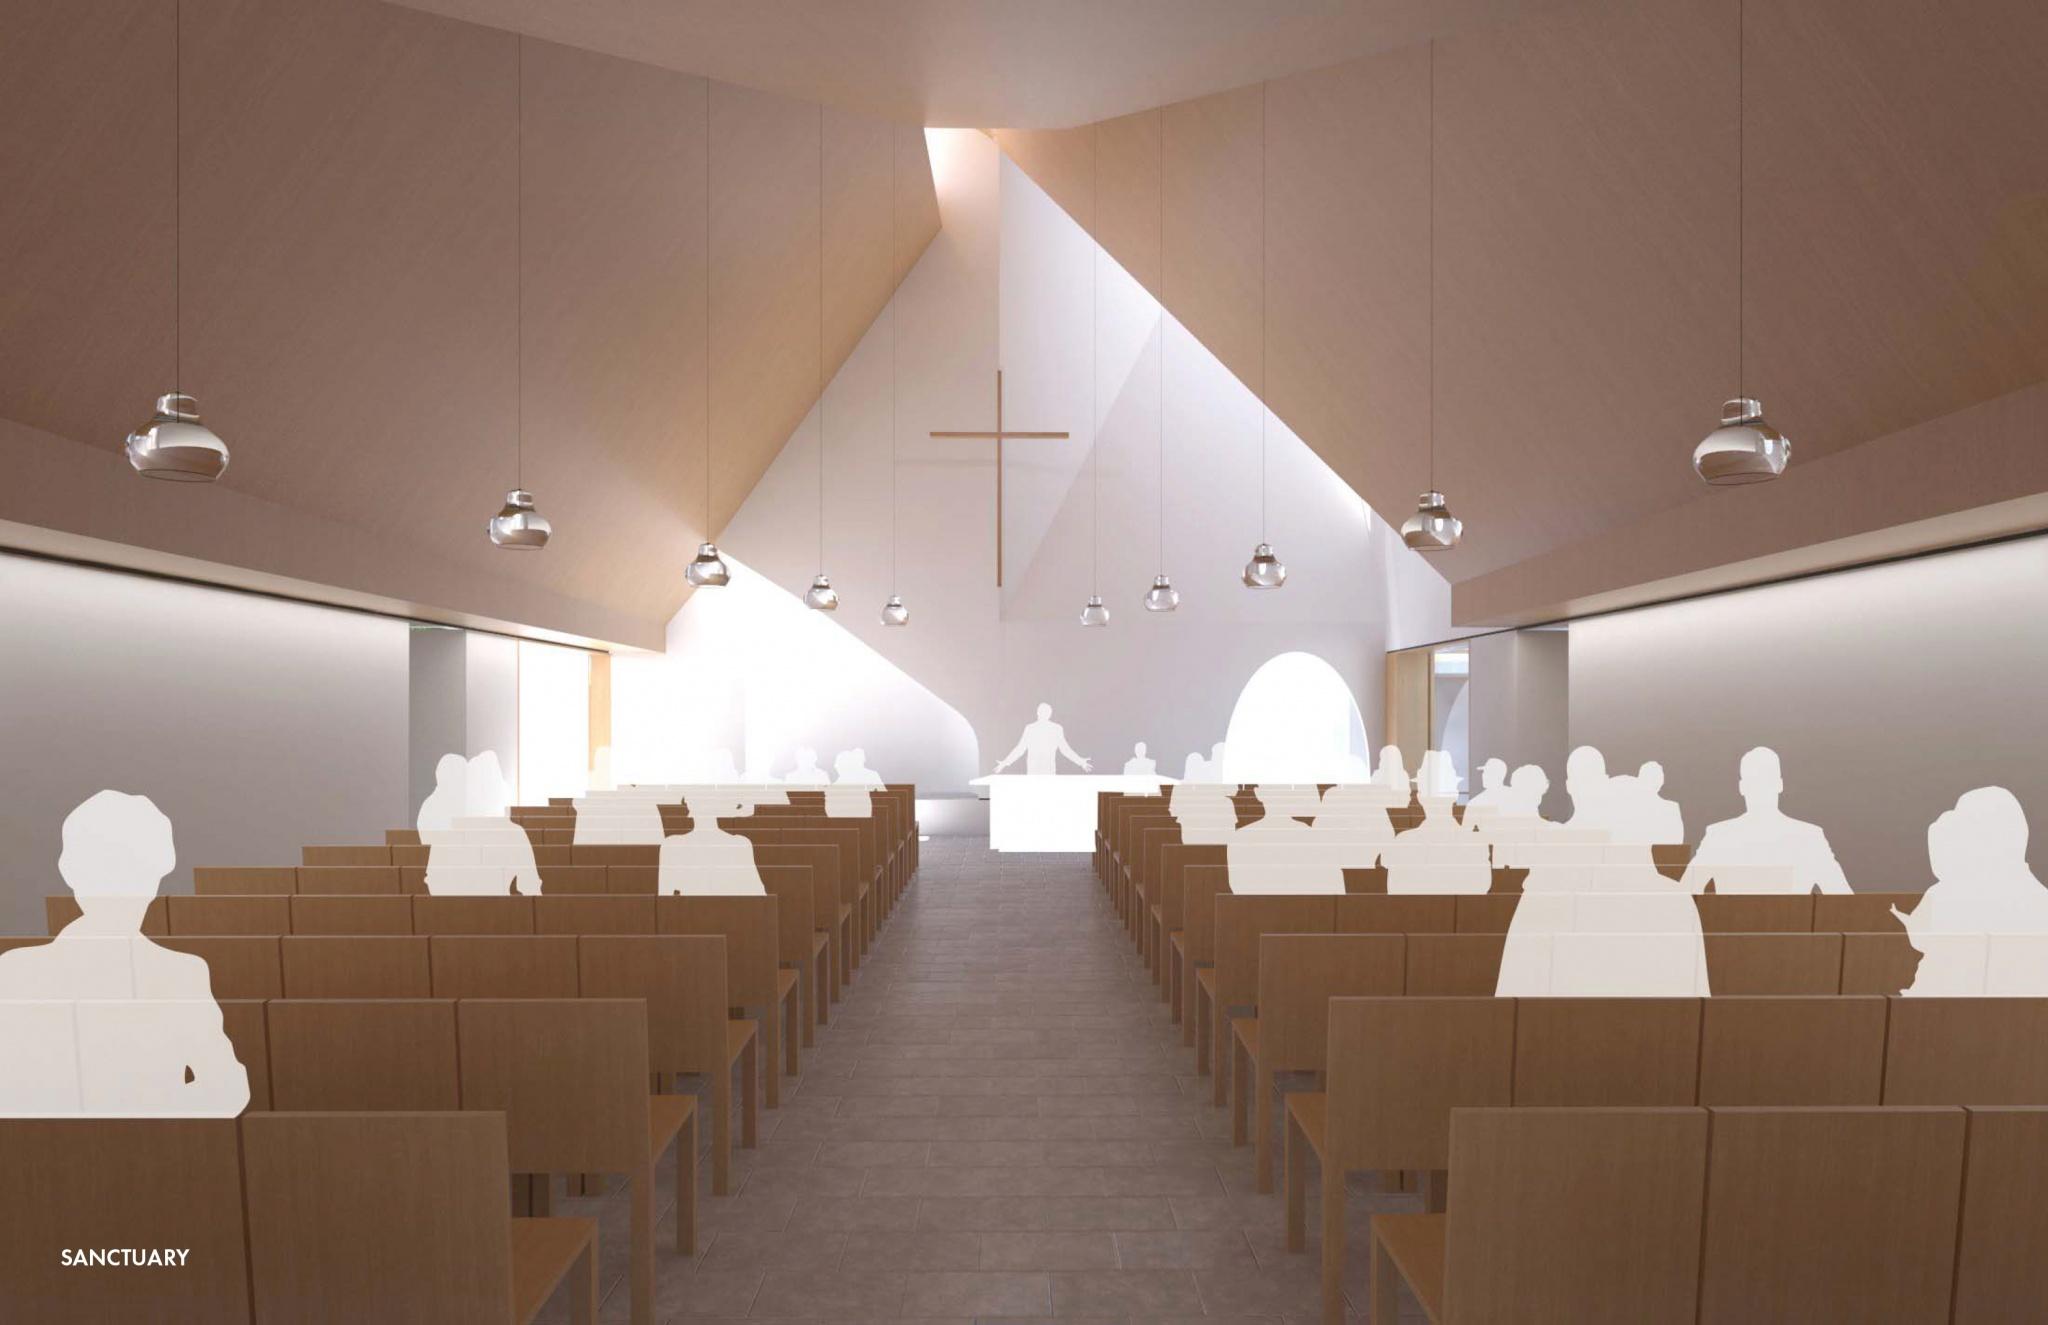 DCC | JKURTZ Architects